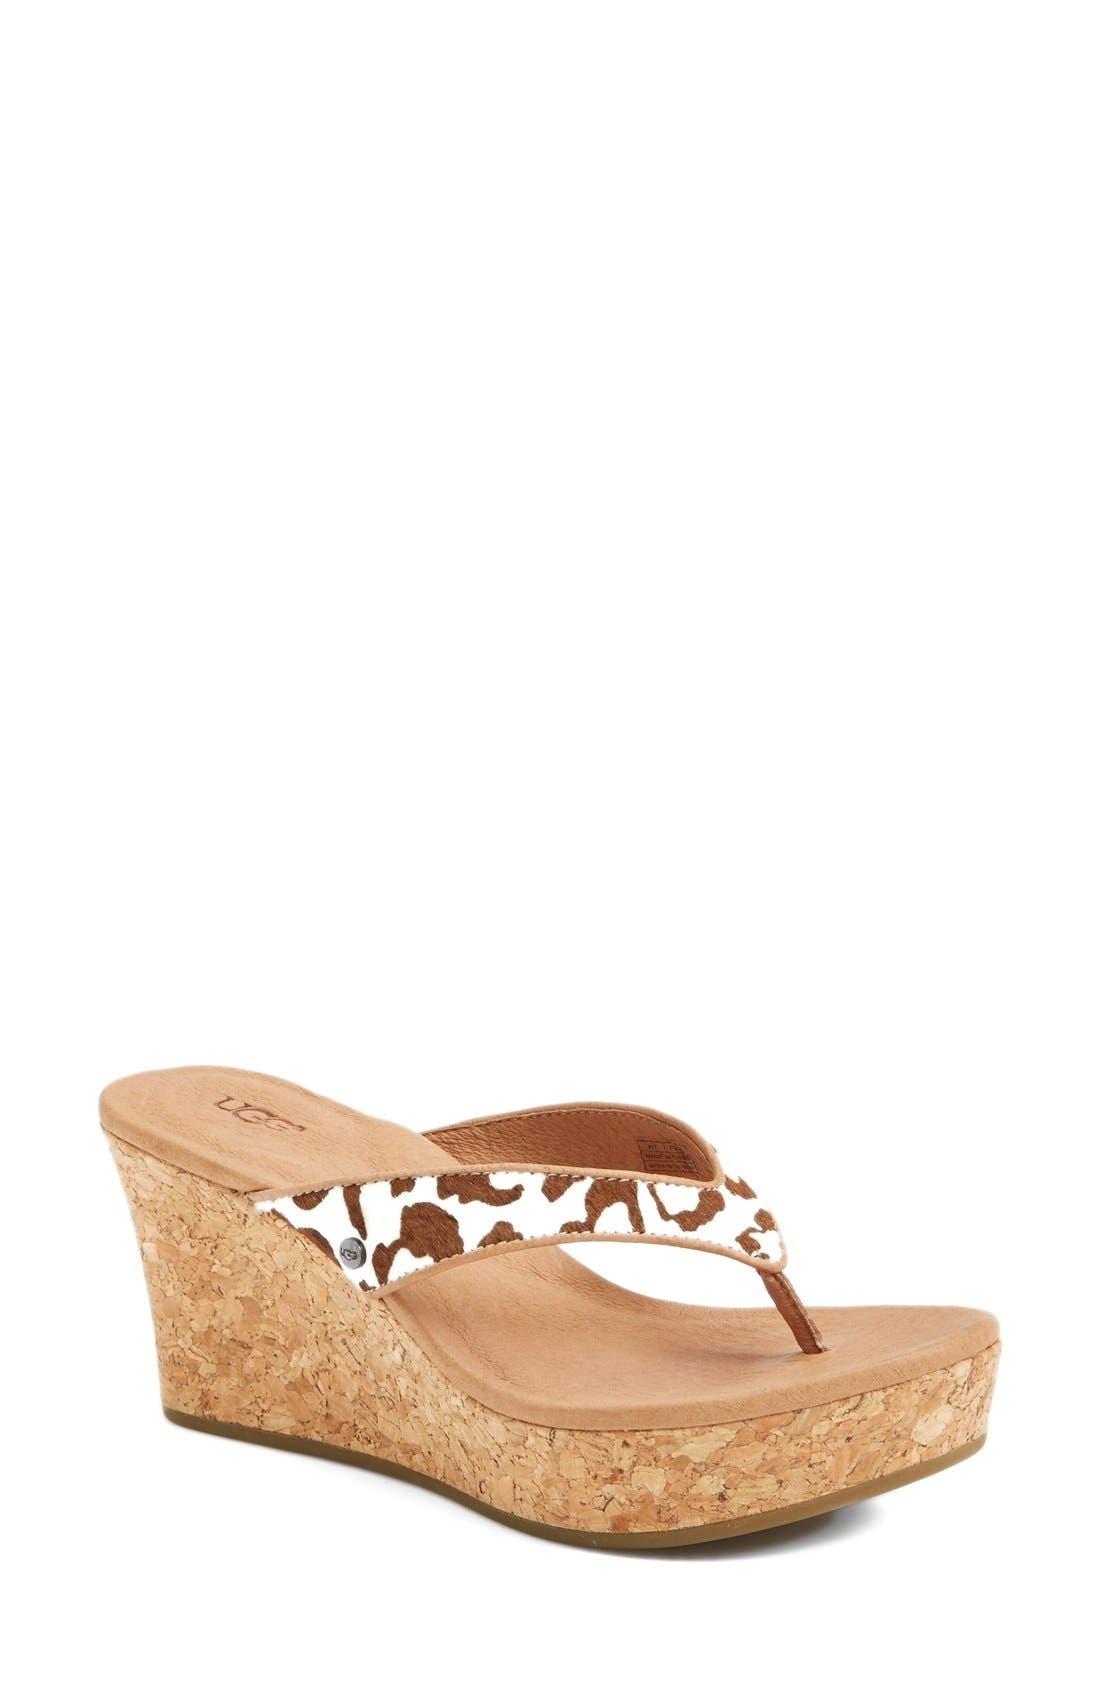 Main Image - UGG Australia 'Natassia' Calf Hair Wedge Sandal (Women)